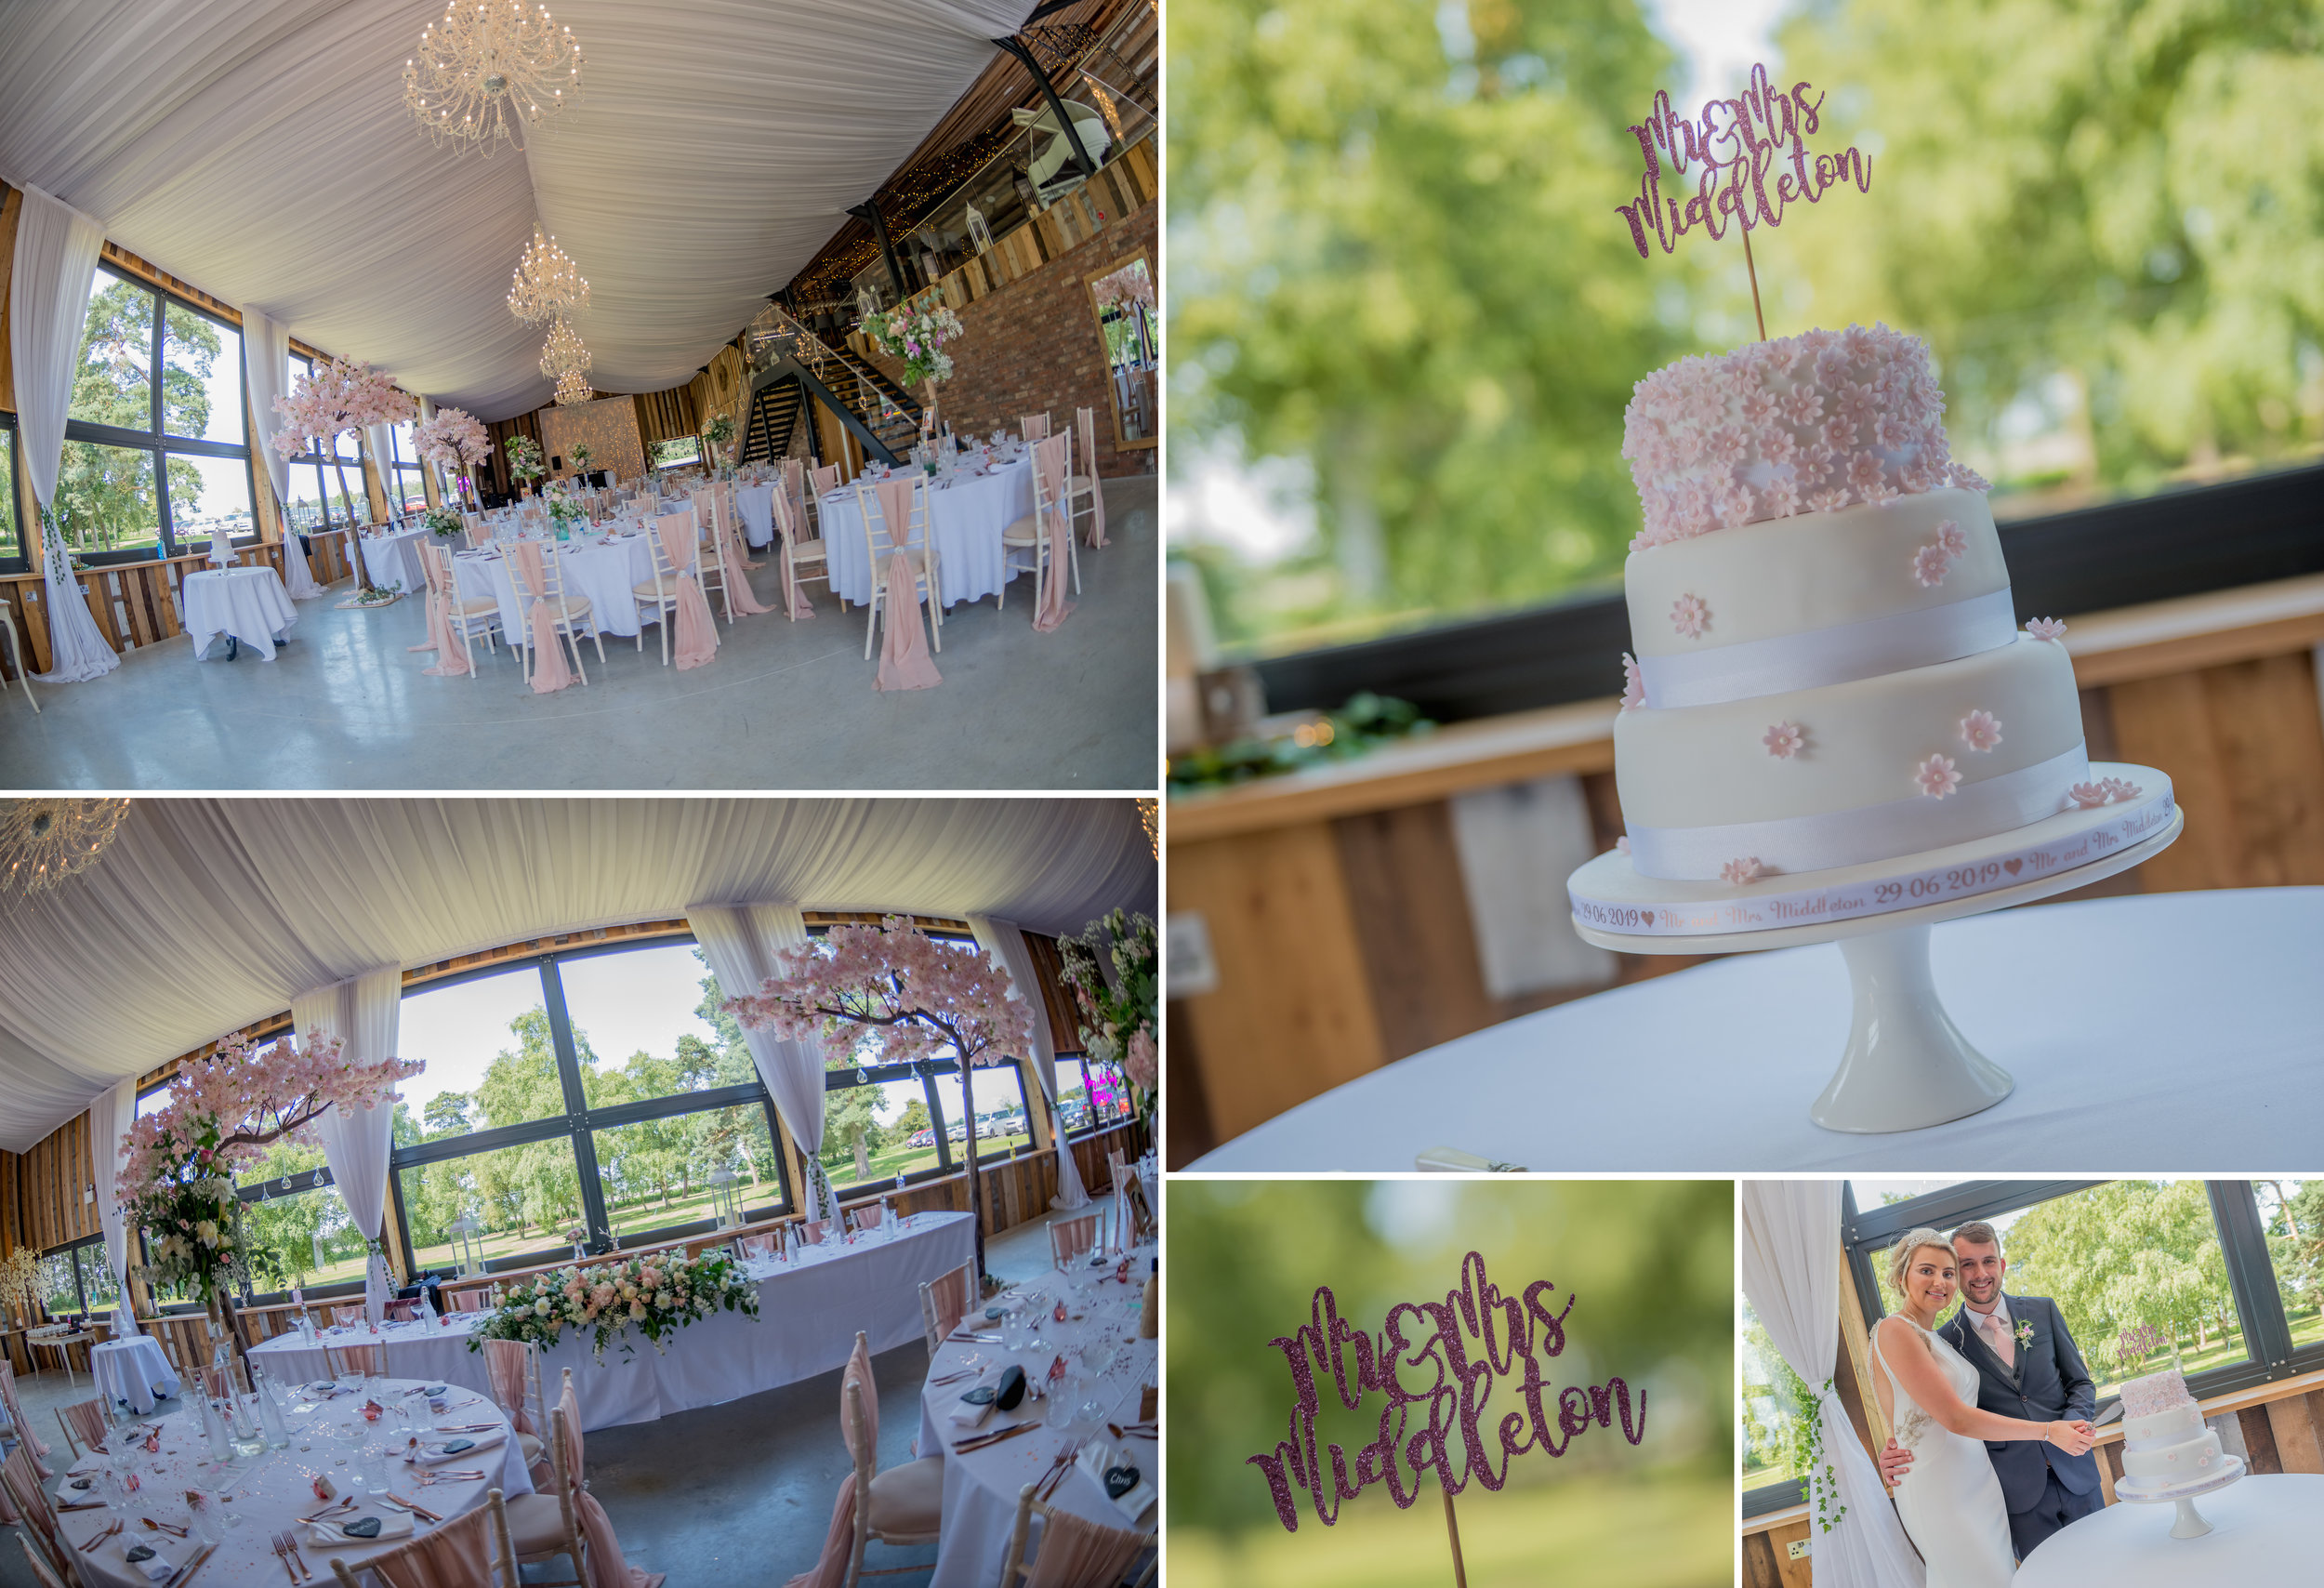 AMY__GEORGE_MIDDLETON_-_29th_June_2019_-_BUNNYHILL_WEDDINGS_13.jpg